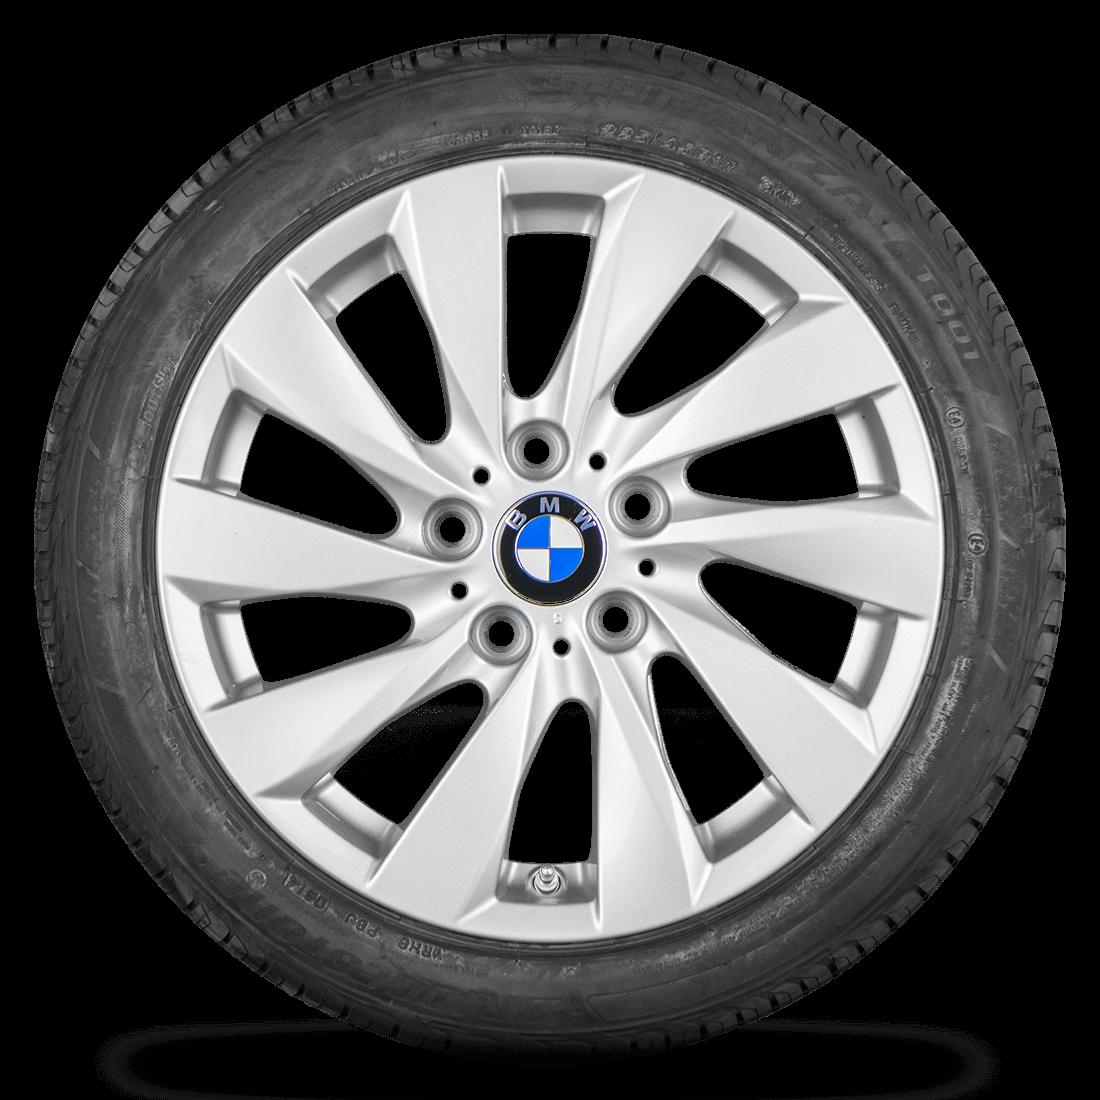 BMW M140i M135i F20 F21 M240i F22 F23 18 Zoll Alufelgen Sommerreifen Styling 381